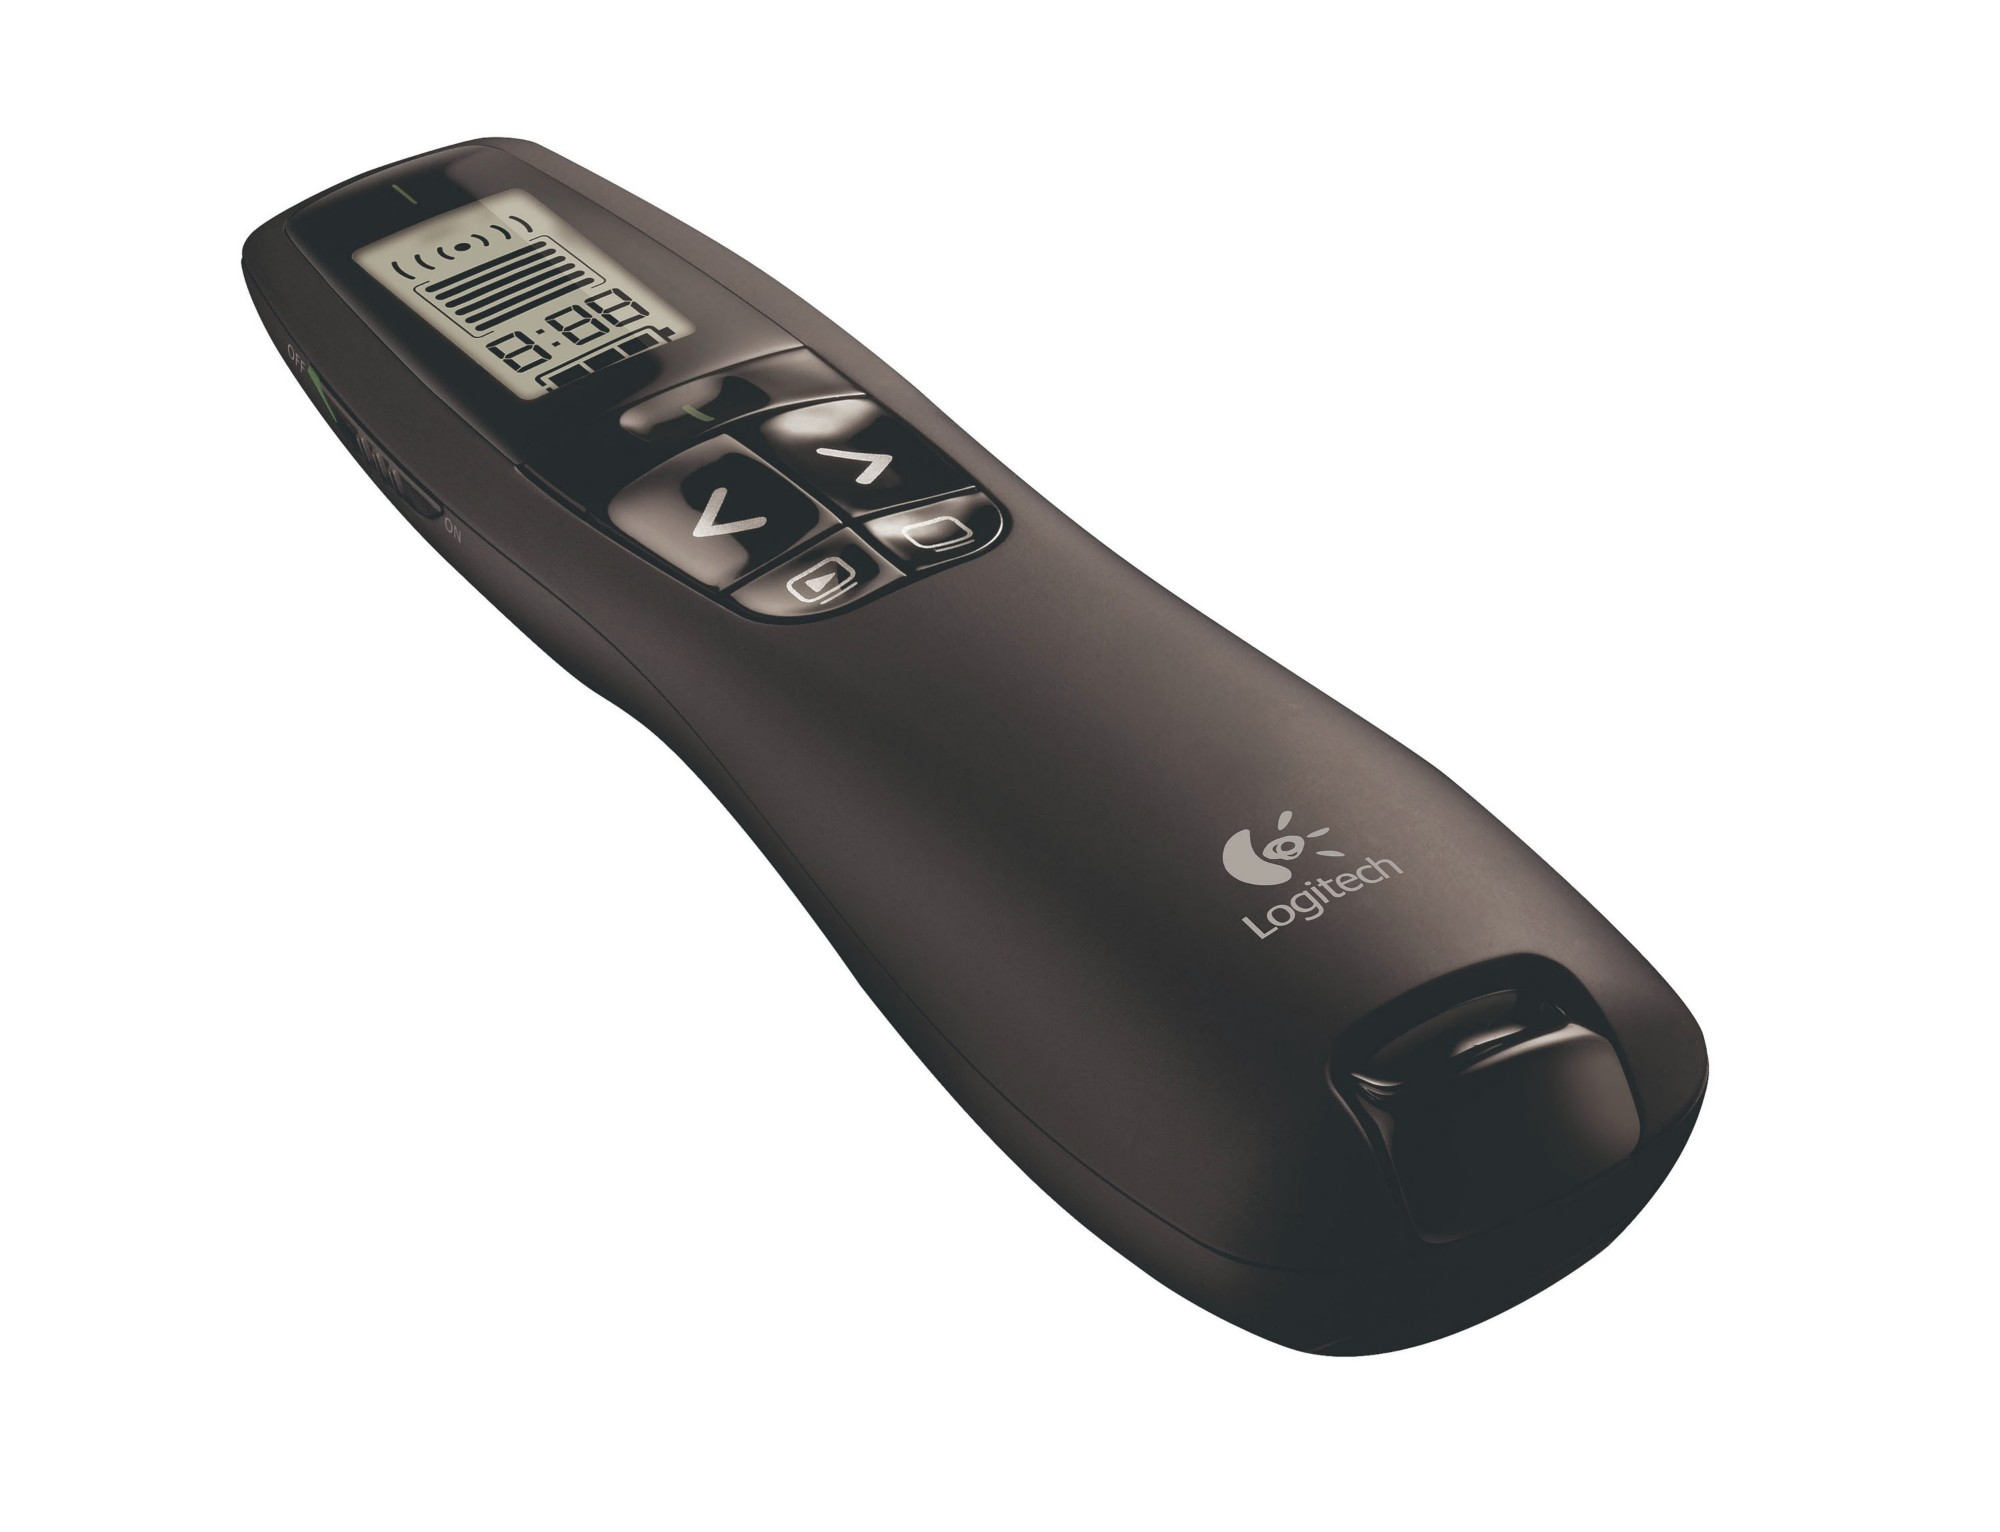 Logitech R400 Black wireless presenter